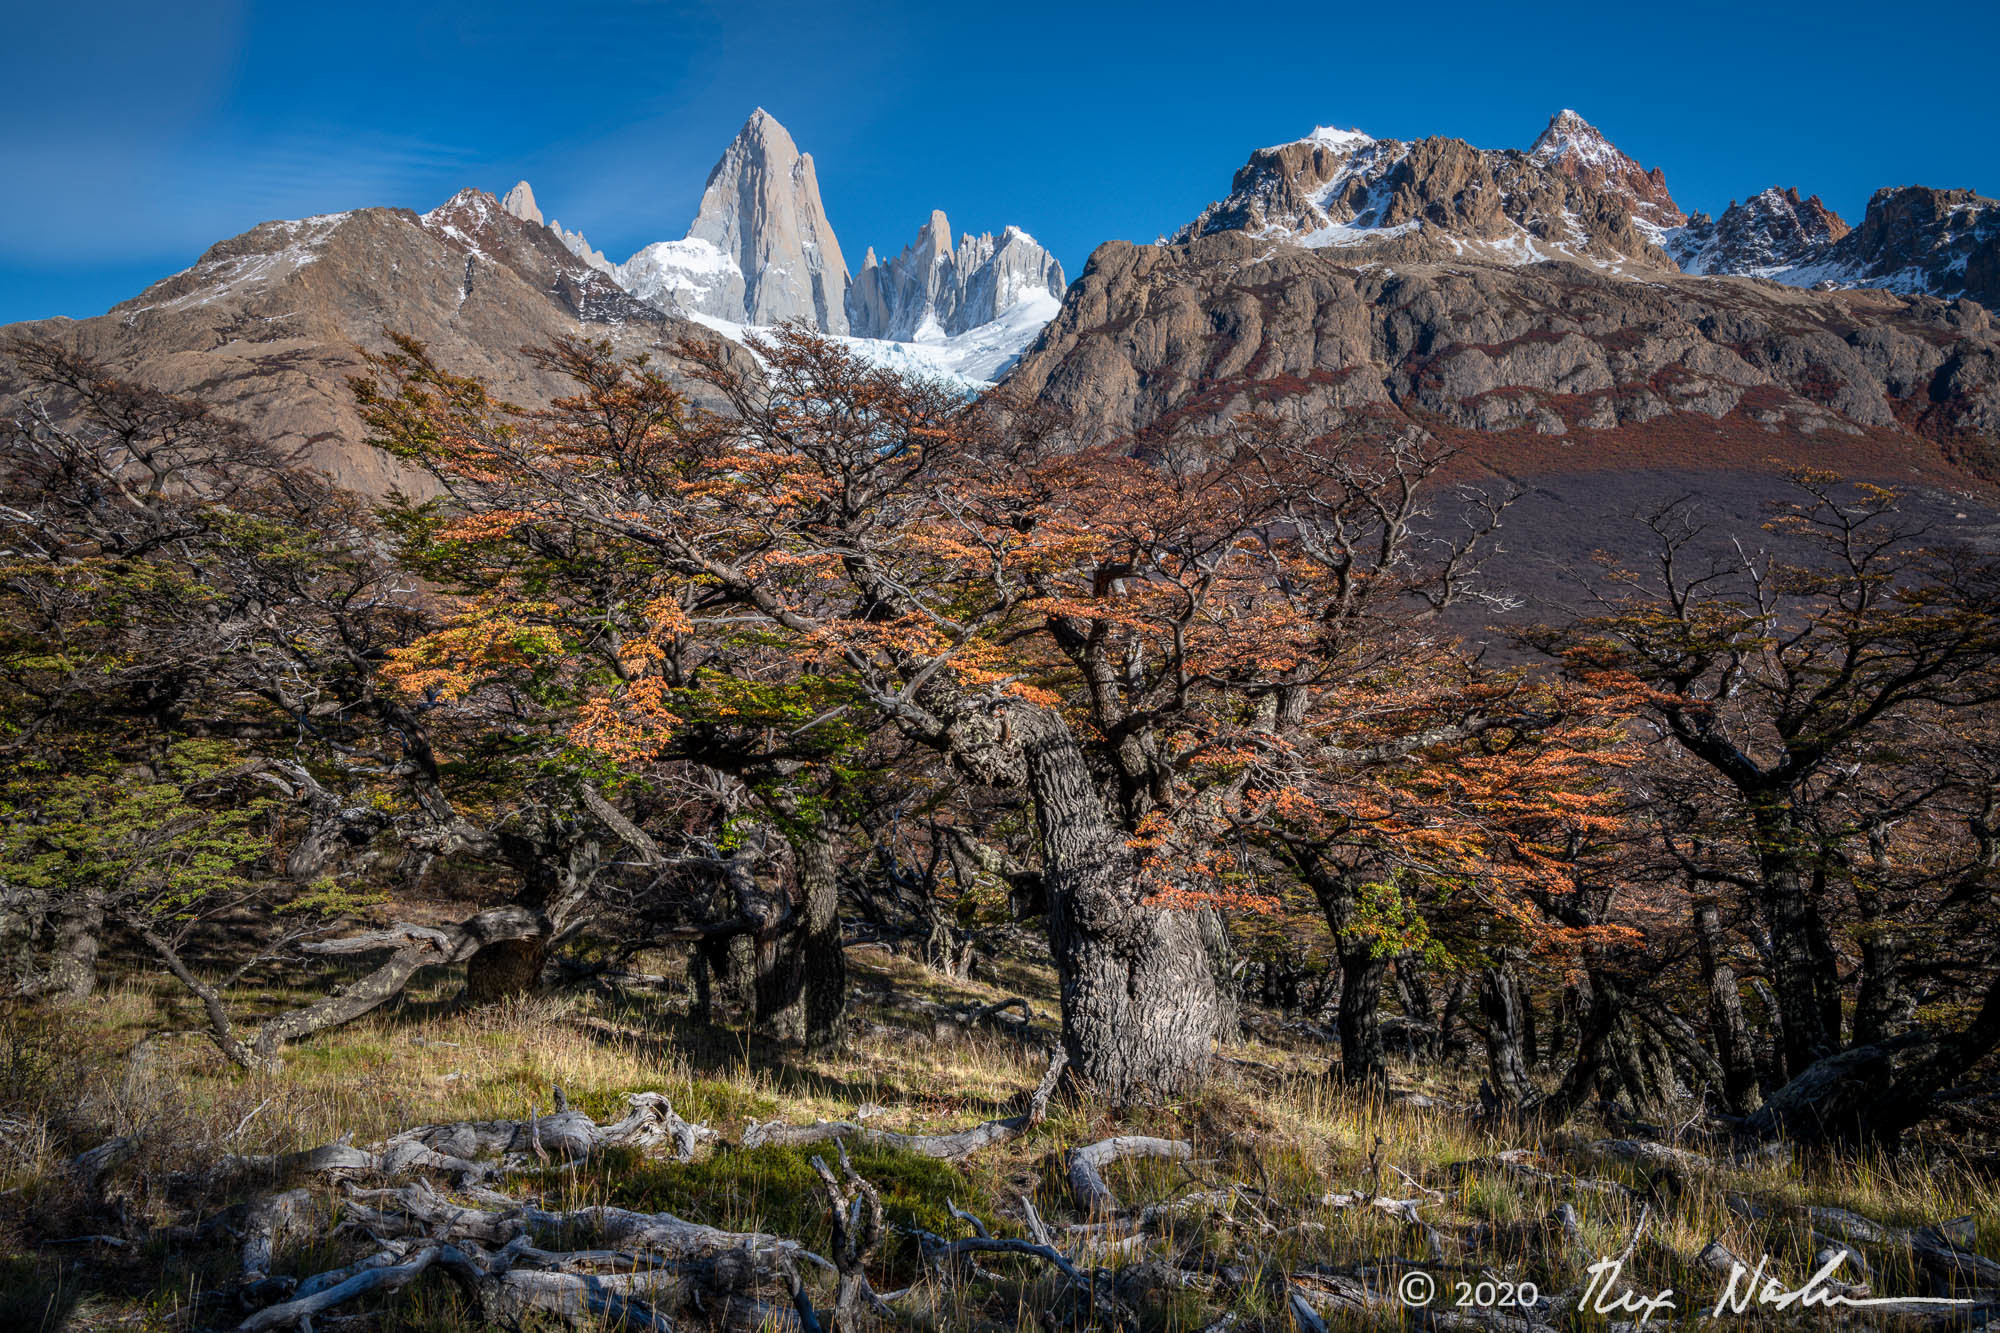 Vieja Lenga - Near El Chalten, Argentina